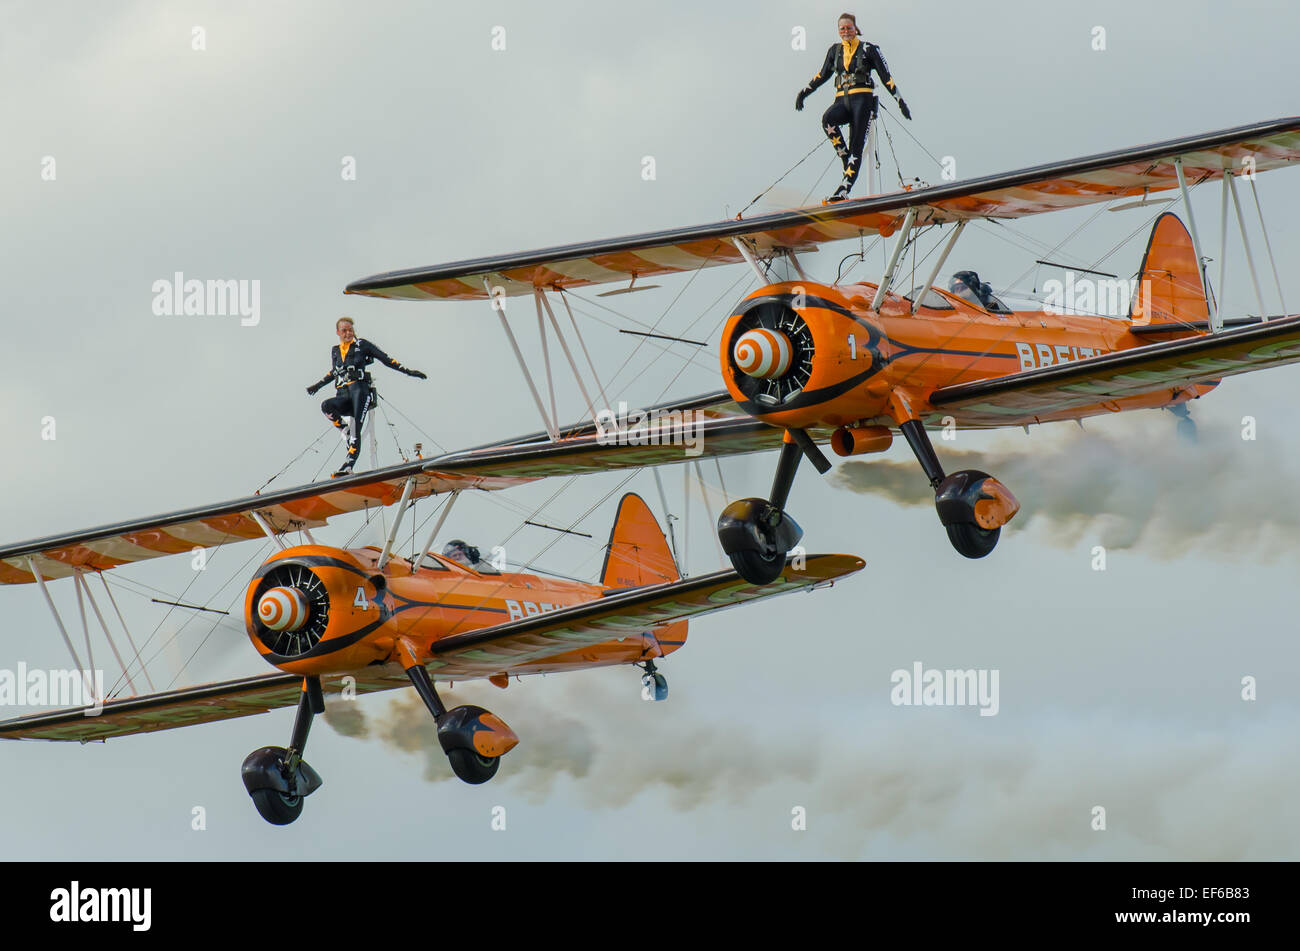 aerosuperbatics-ltd-is-a-british-aerobatics-and-wingwalking-team-as-EF6B83.jpg